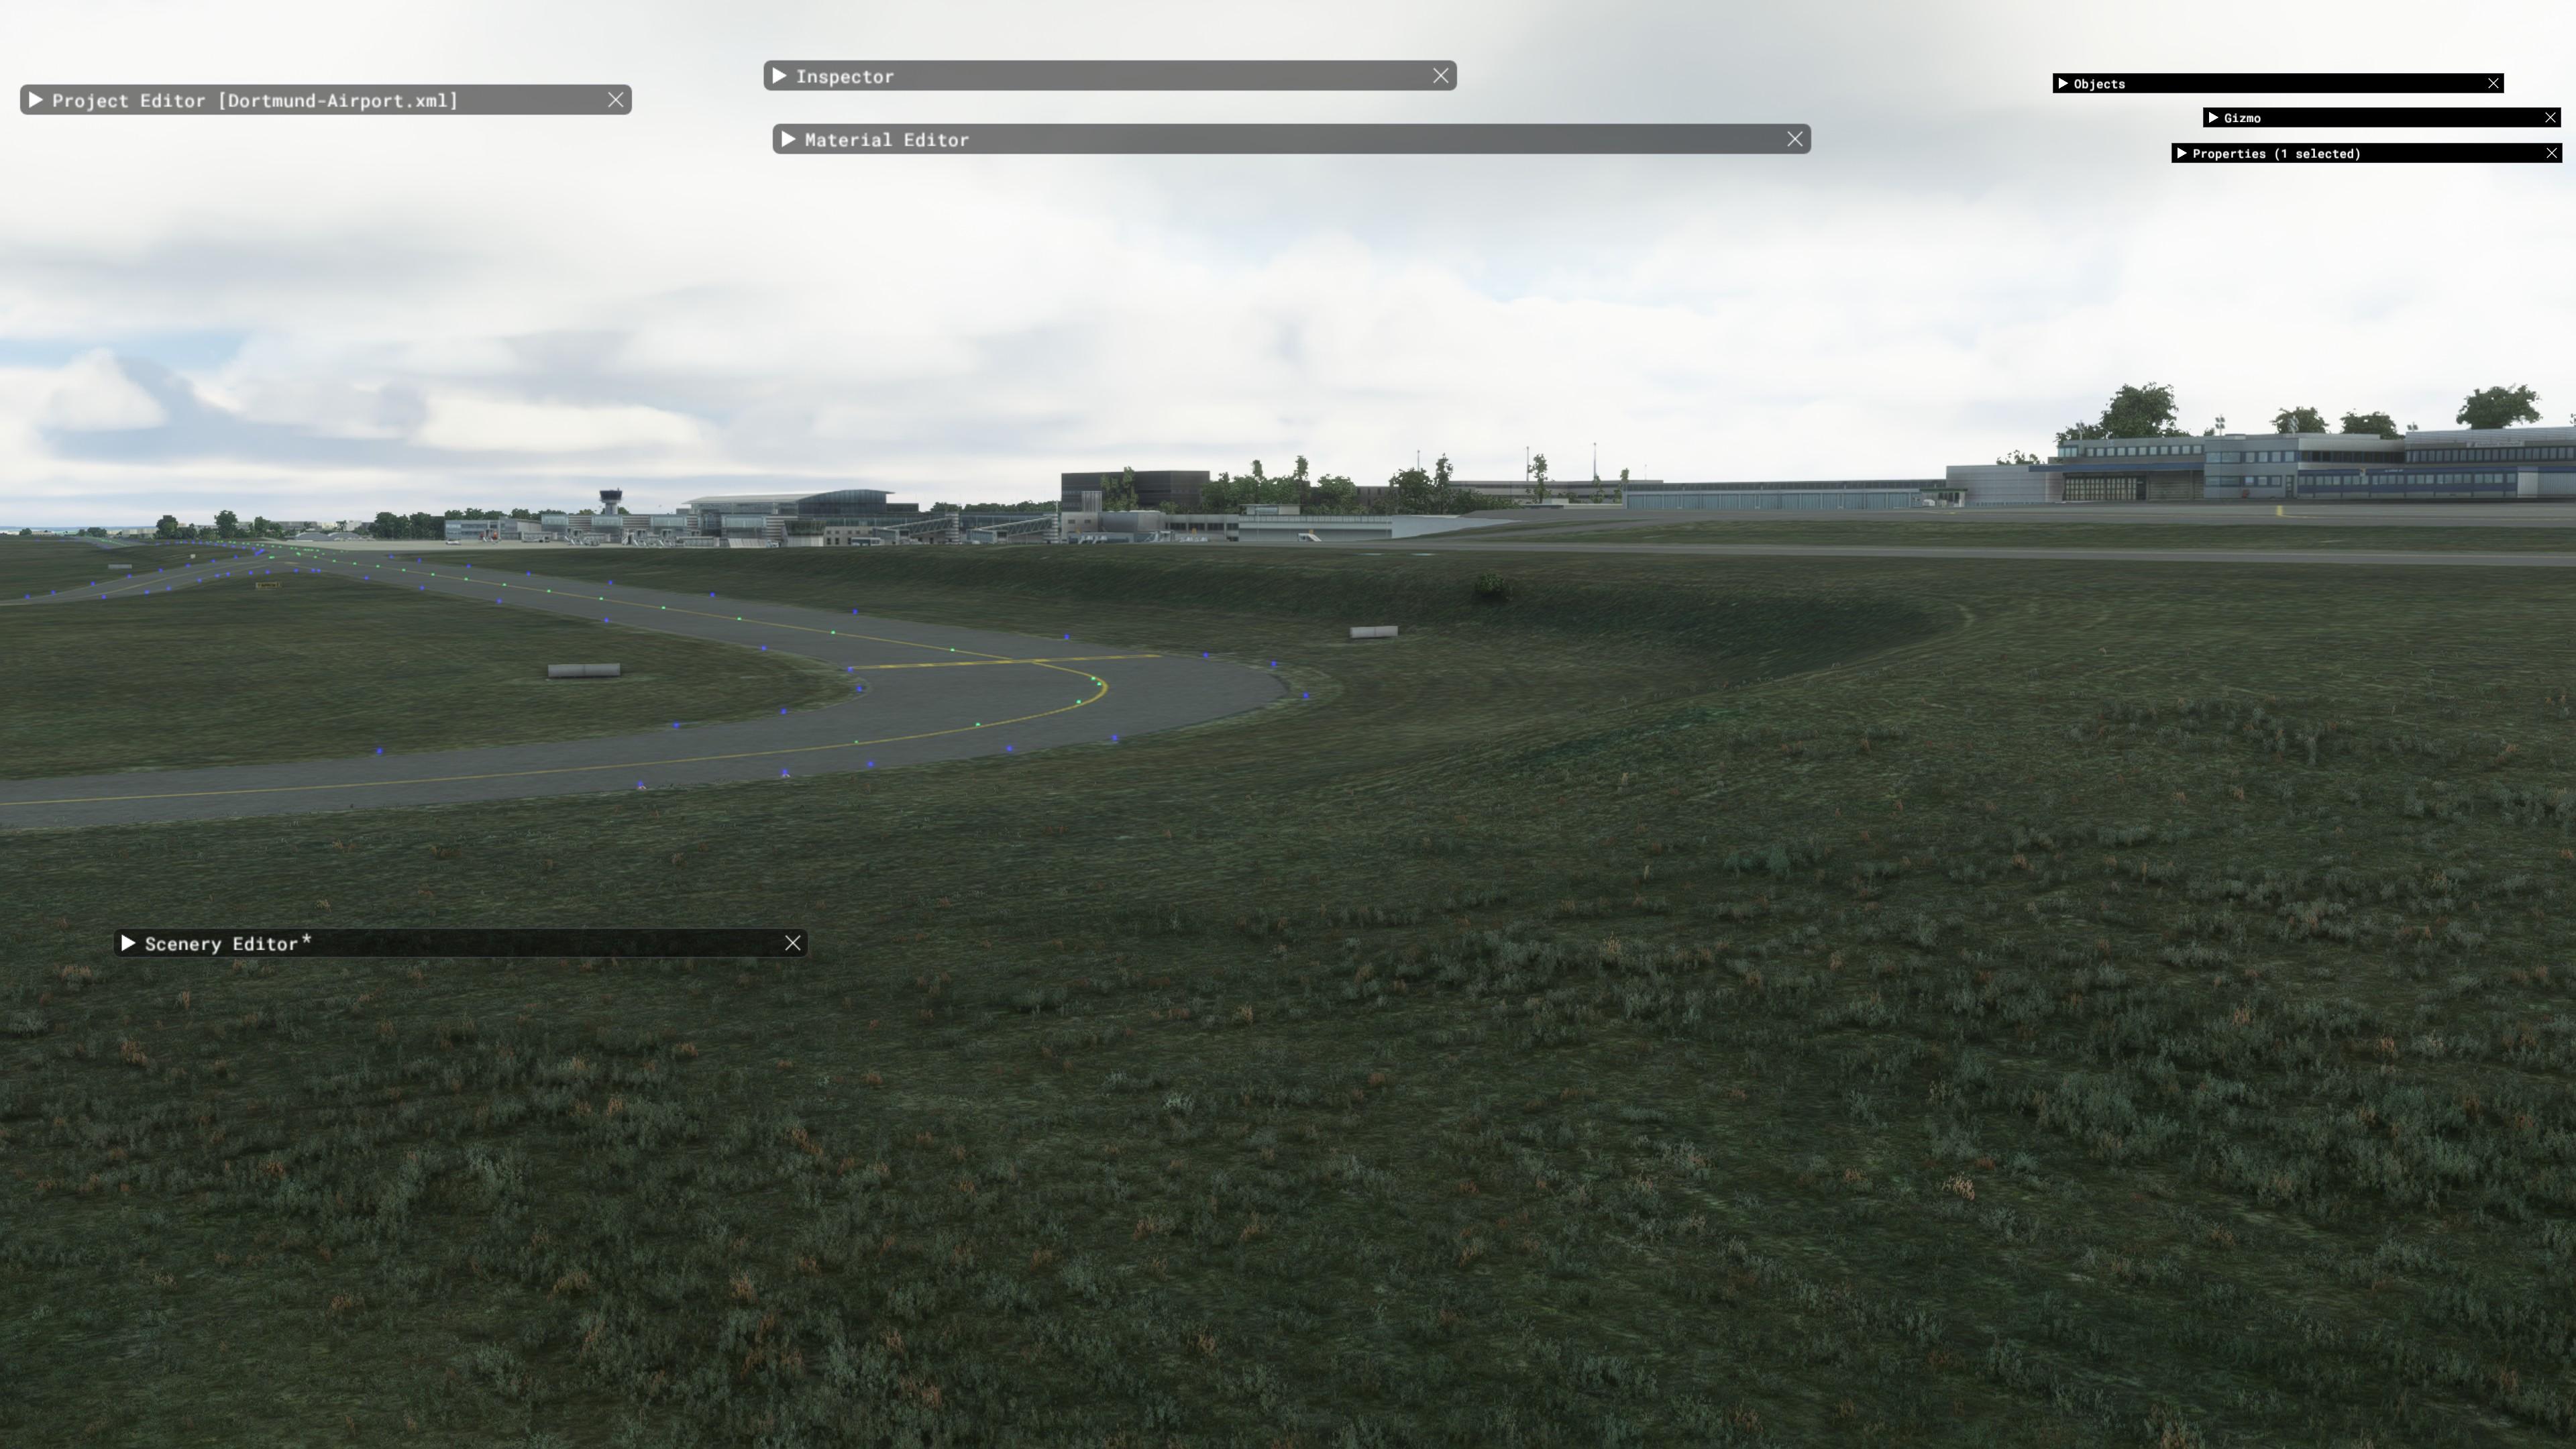 mfs_lidar_adata_edlw_airport_1.jpg